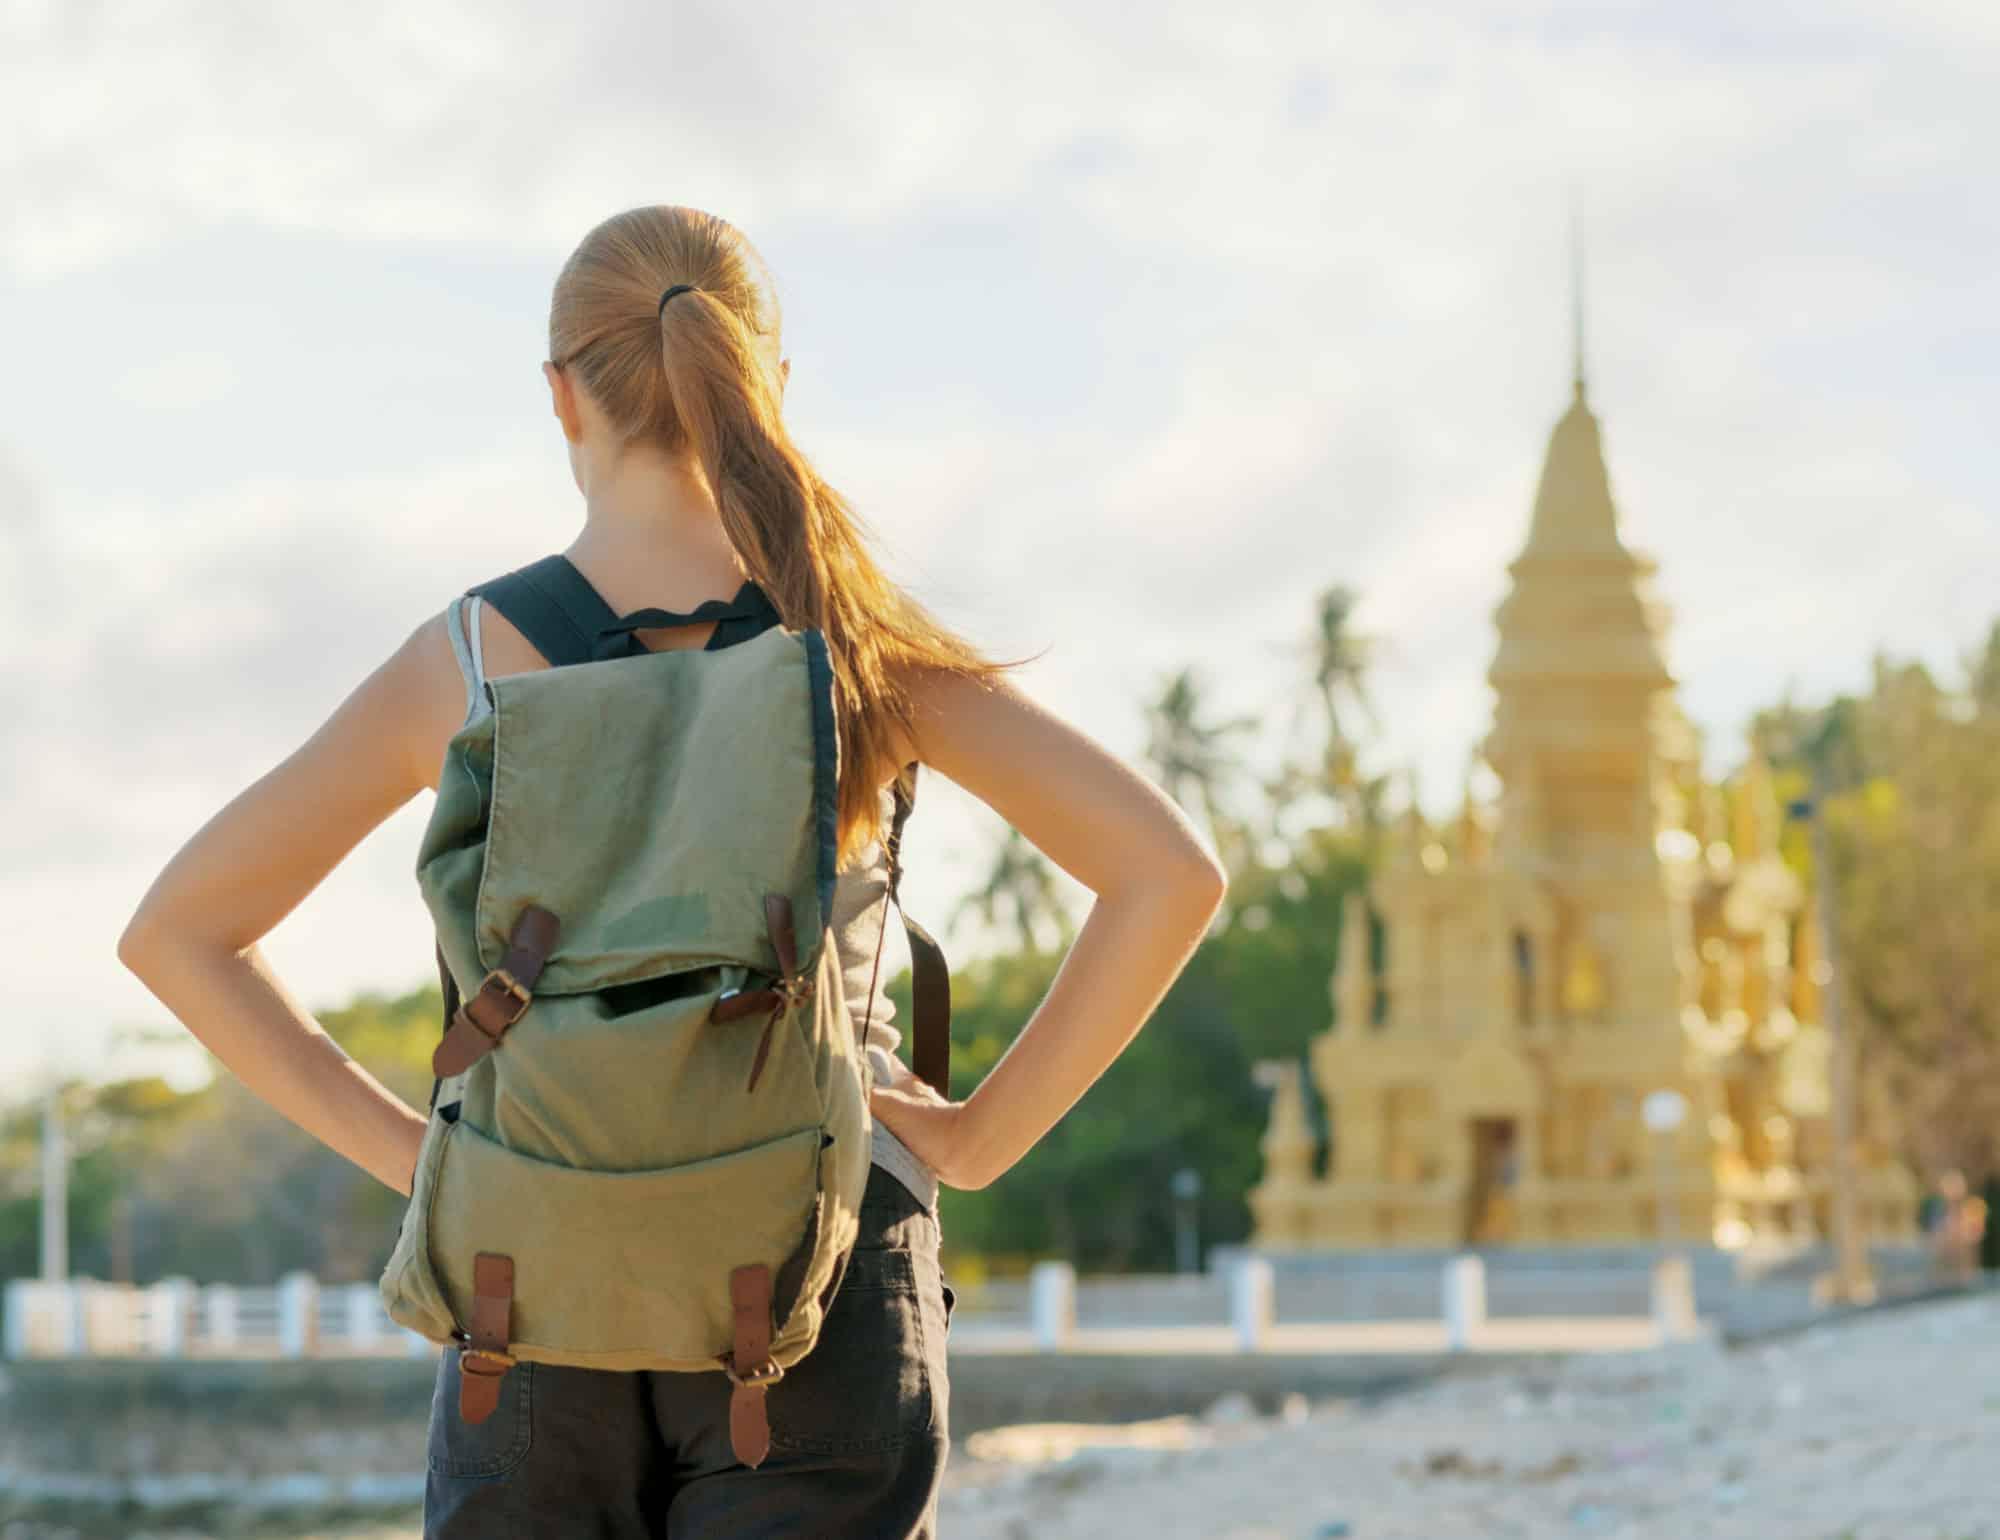 Mujer con mochila frente a una Pagoda, en Asia